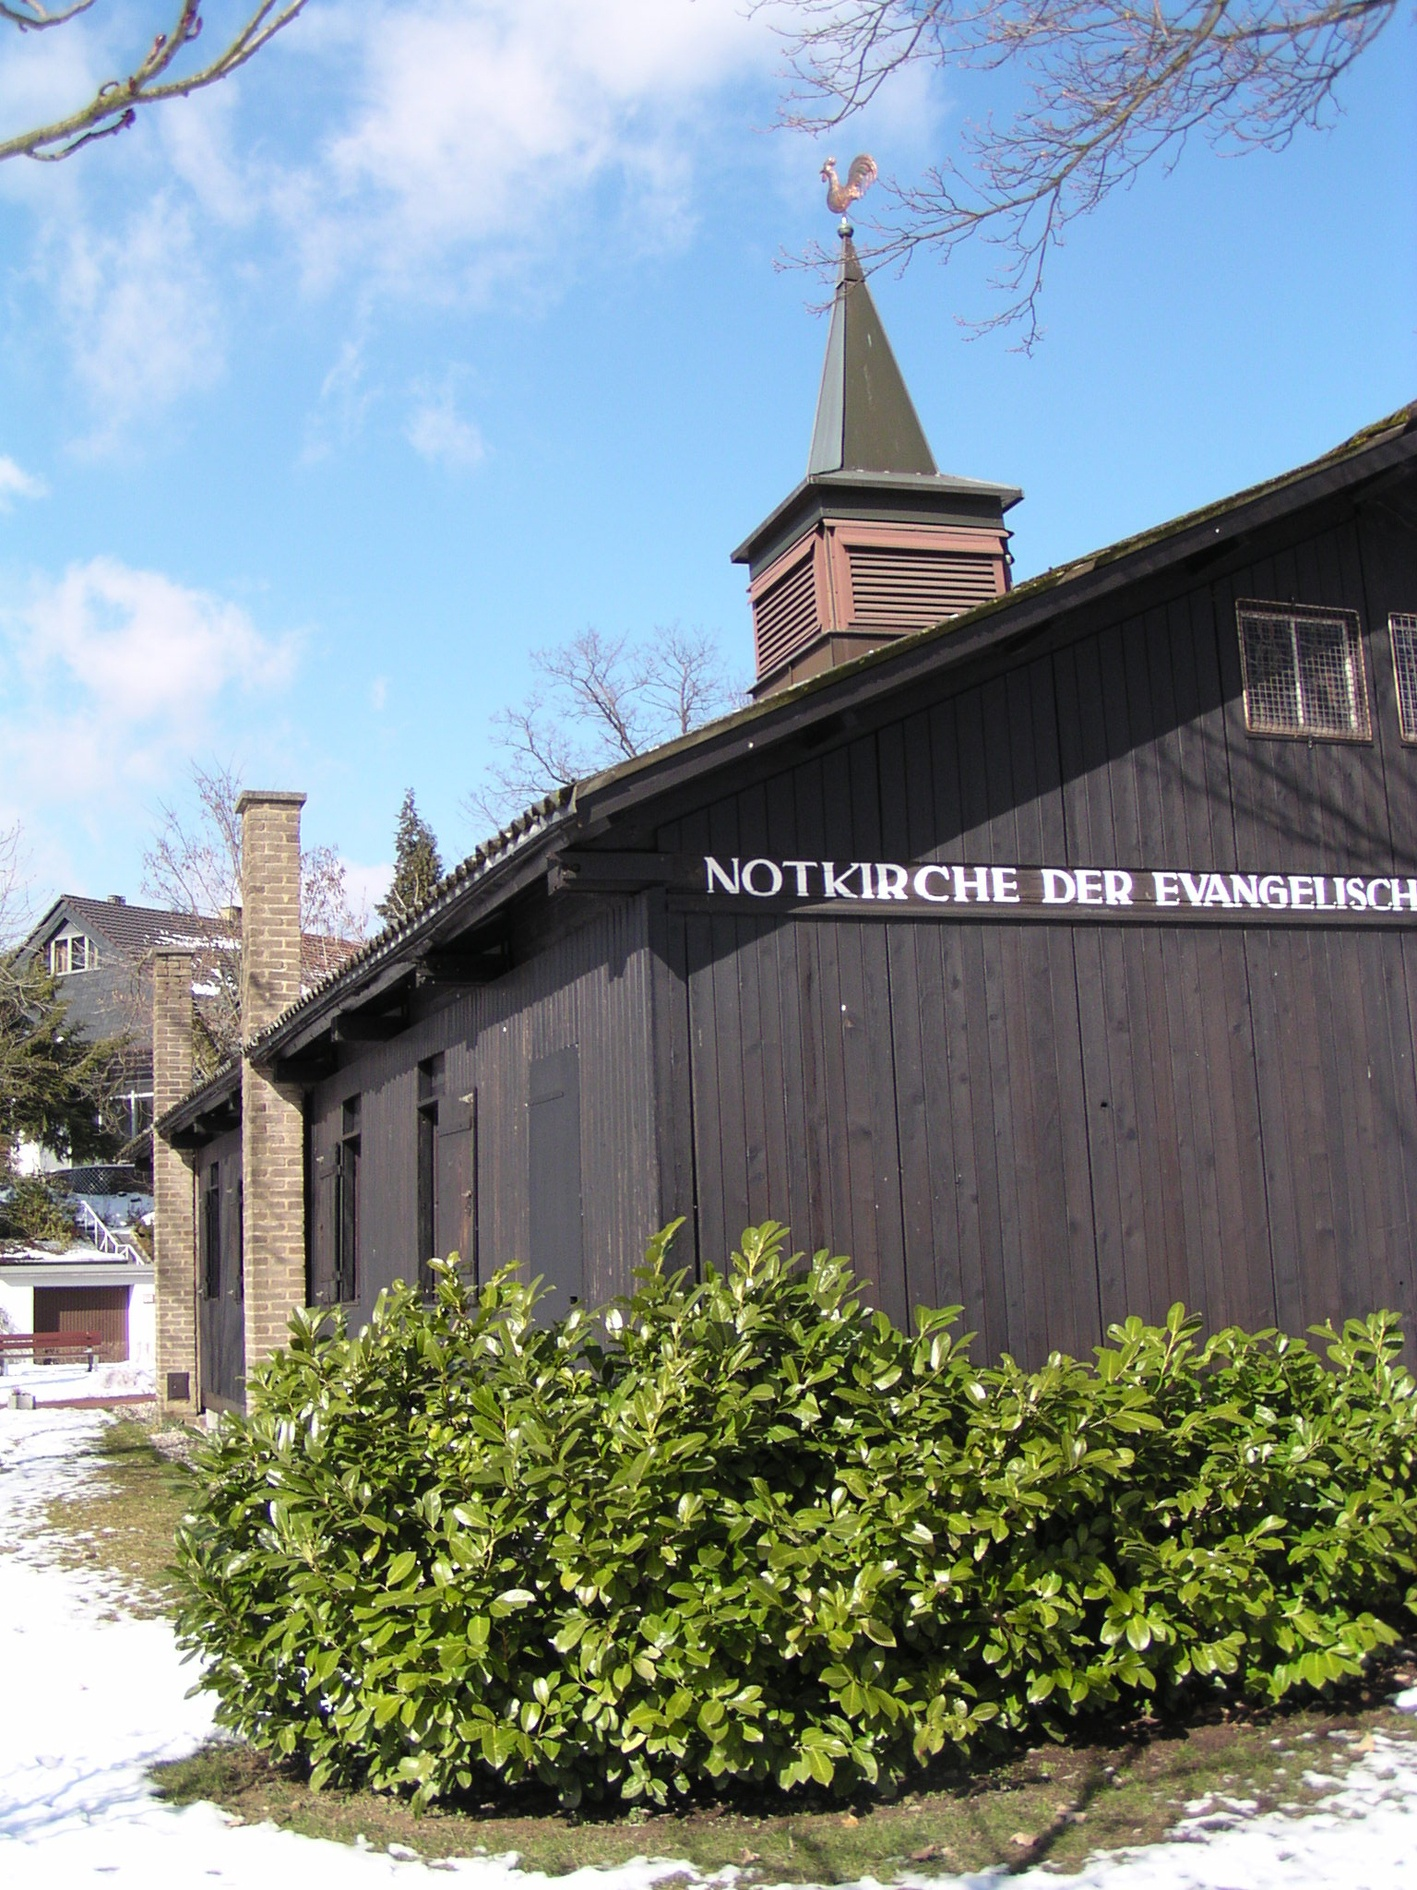 Notkirche, Saarbrücken